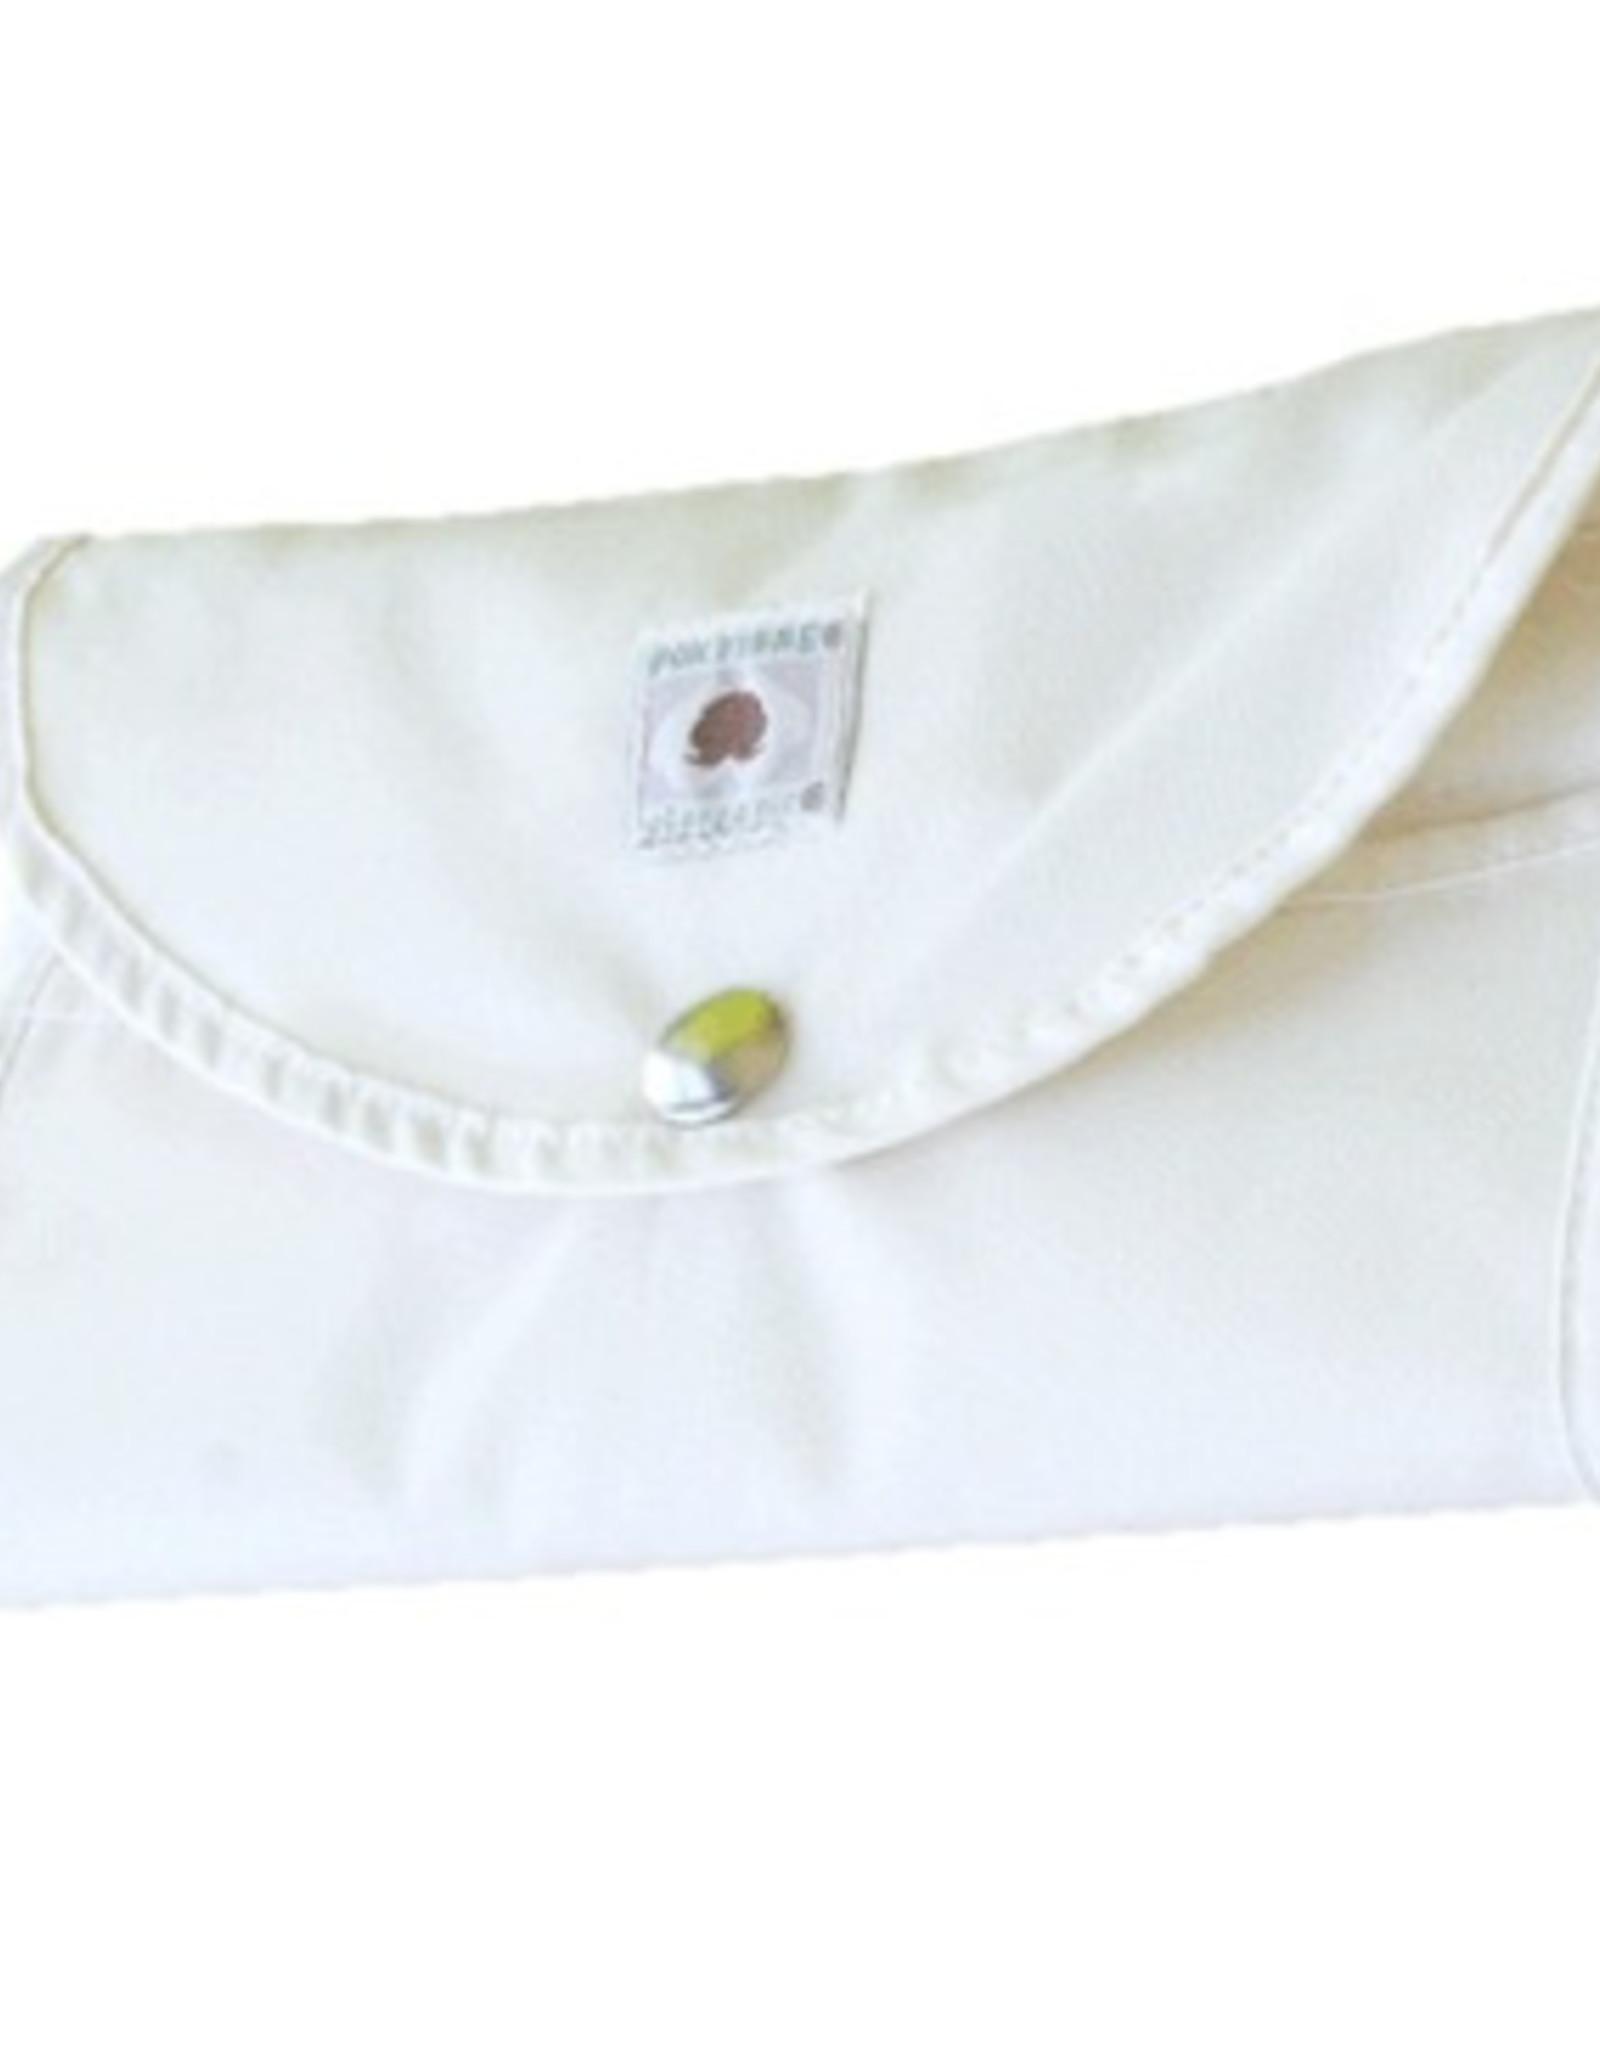 Cooliflower folded bag.